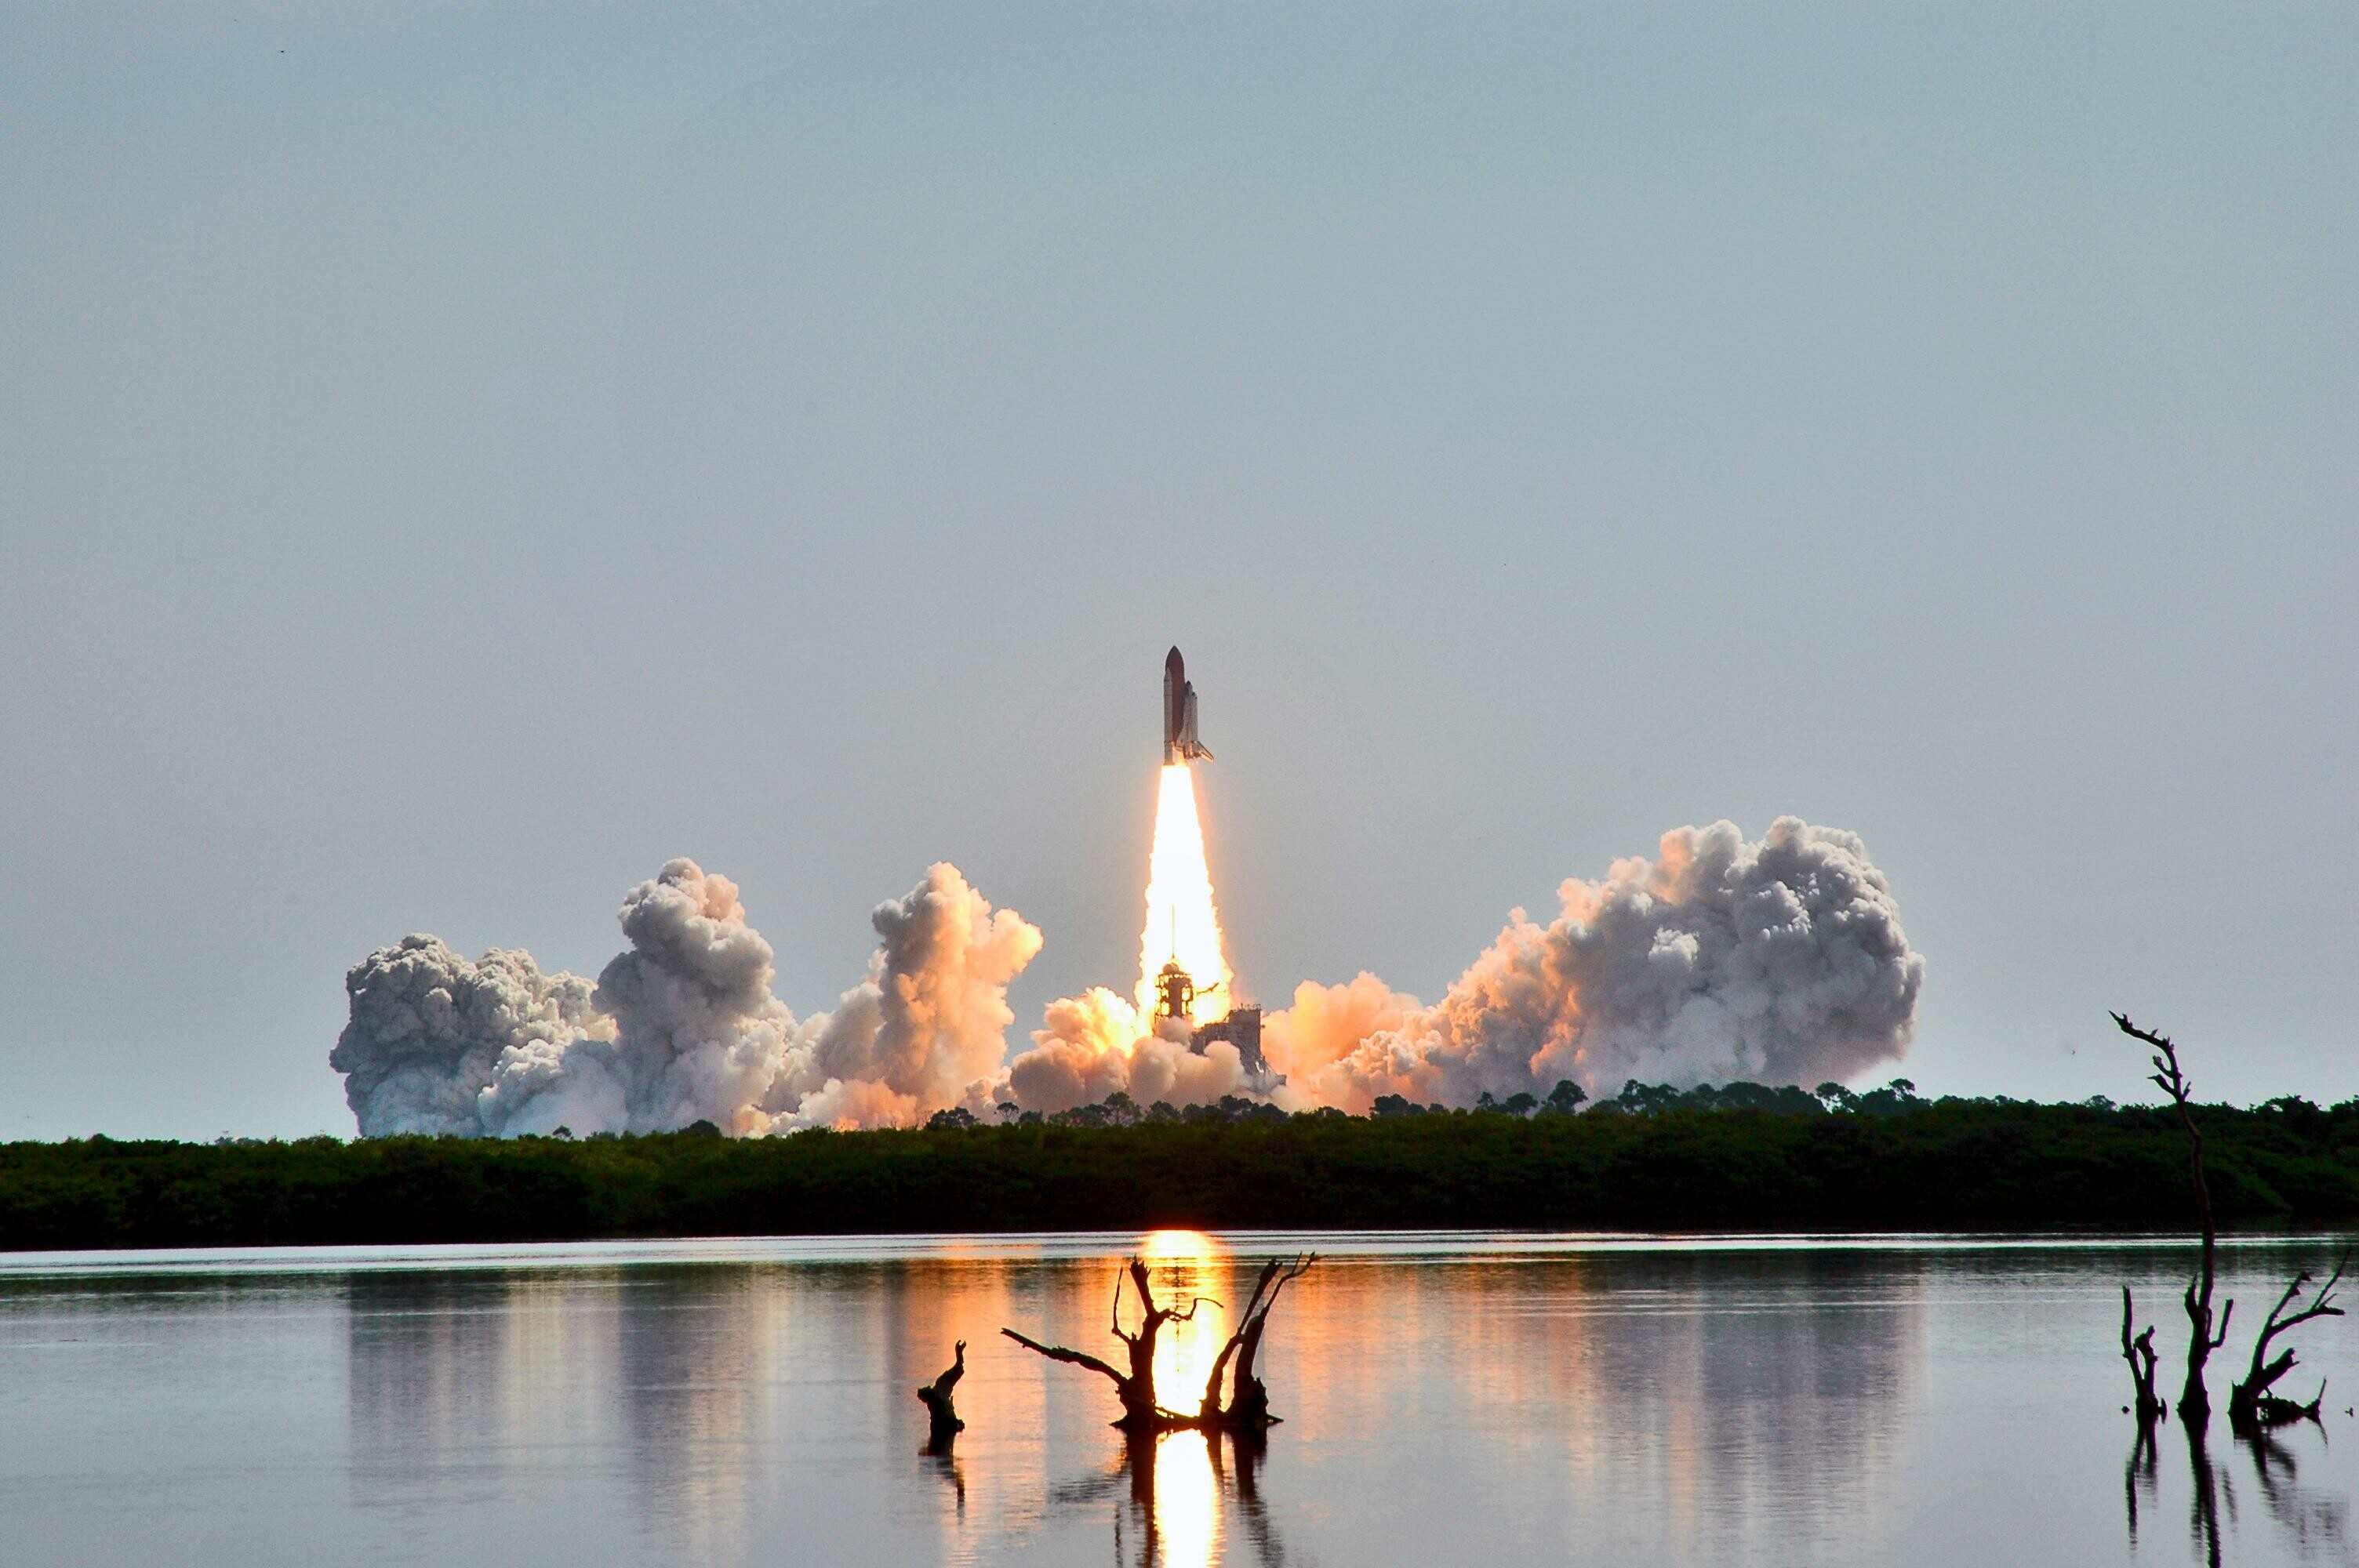 space shuttle erster start - photo #39